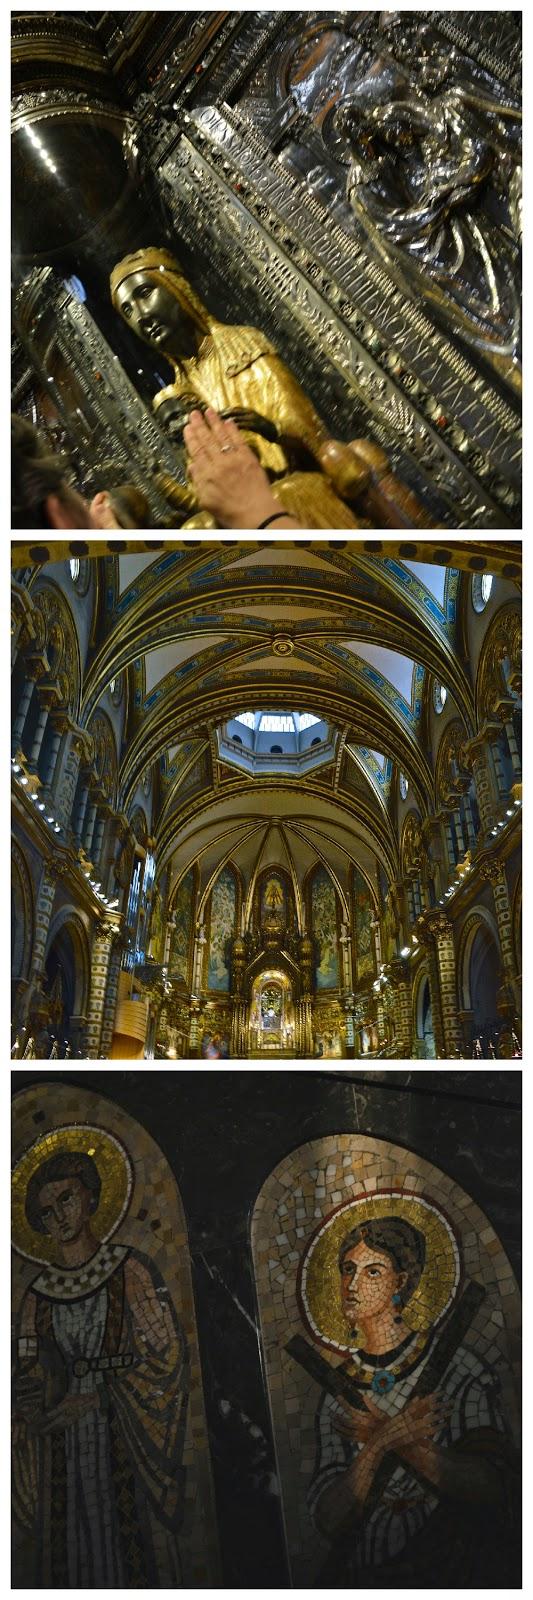 Sleachmour Adventures: Monserrat Abbey